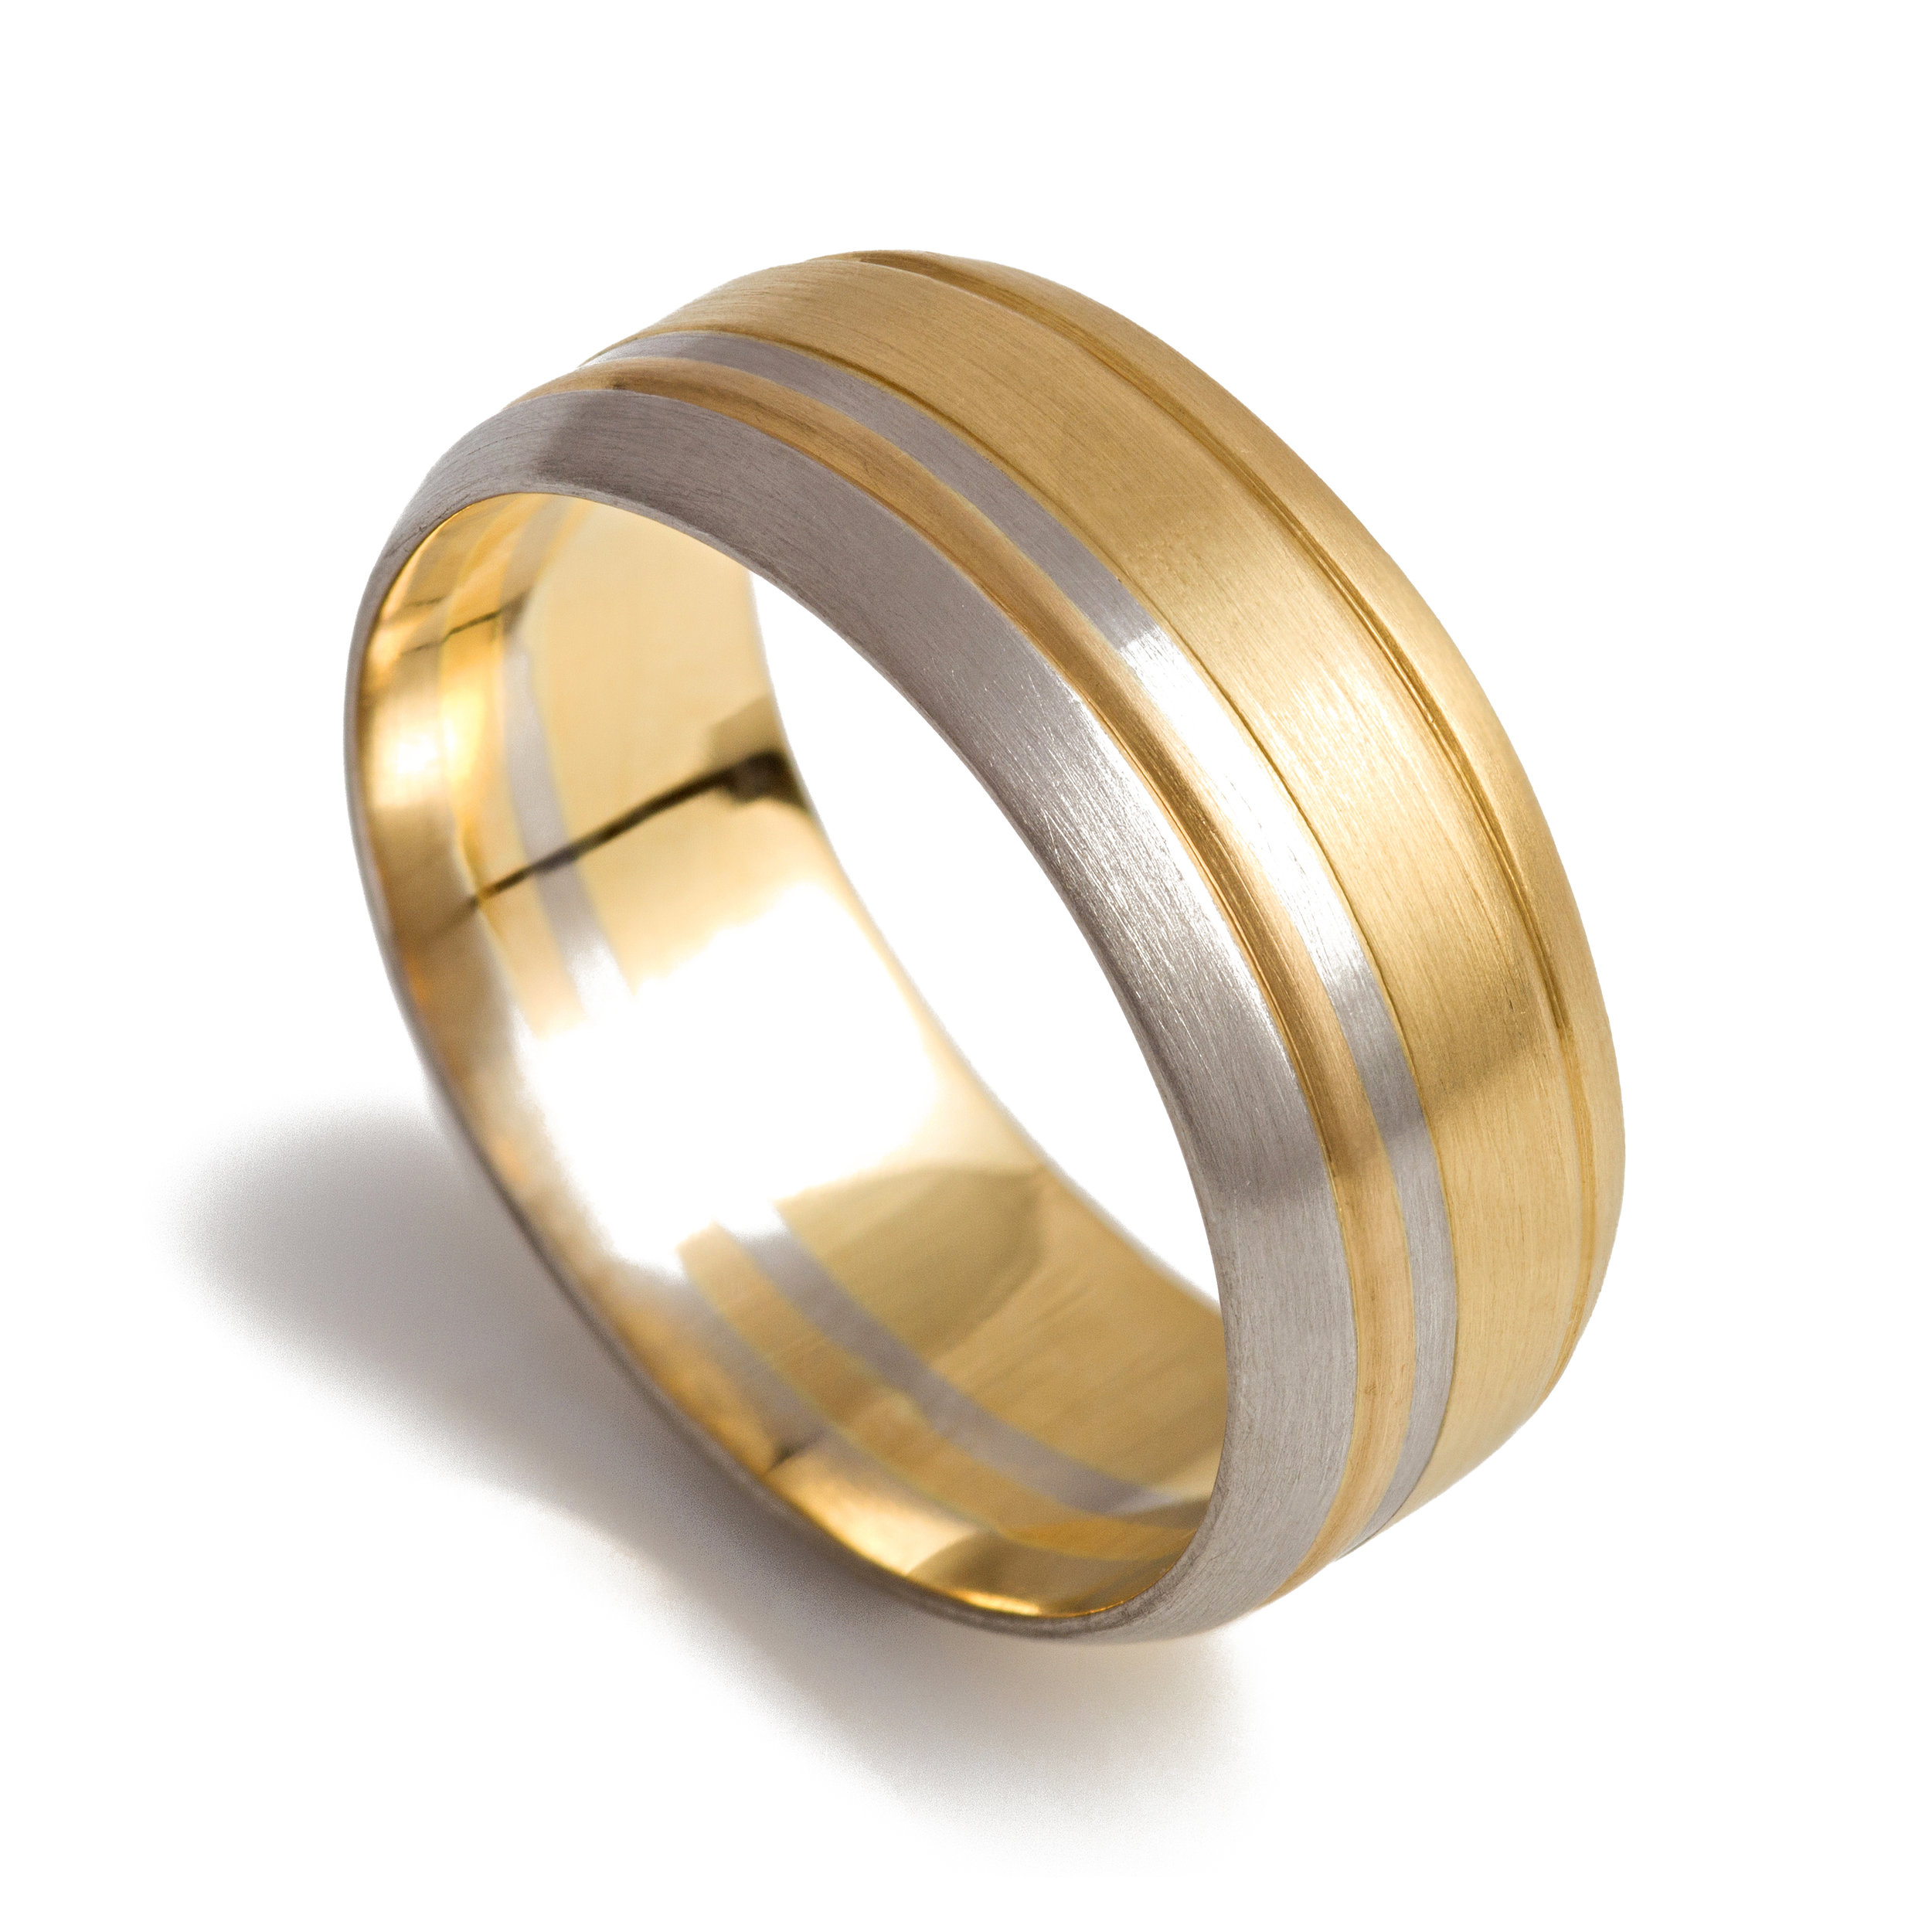 18ct yellow gold and platinum wedding band - £2,382